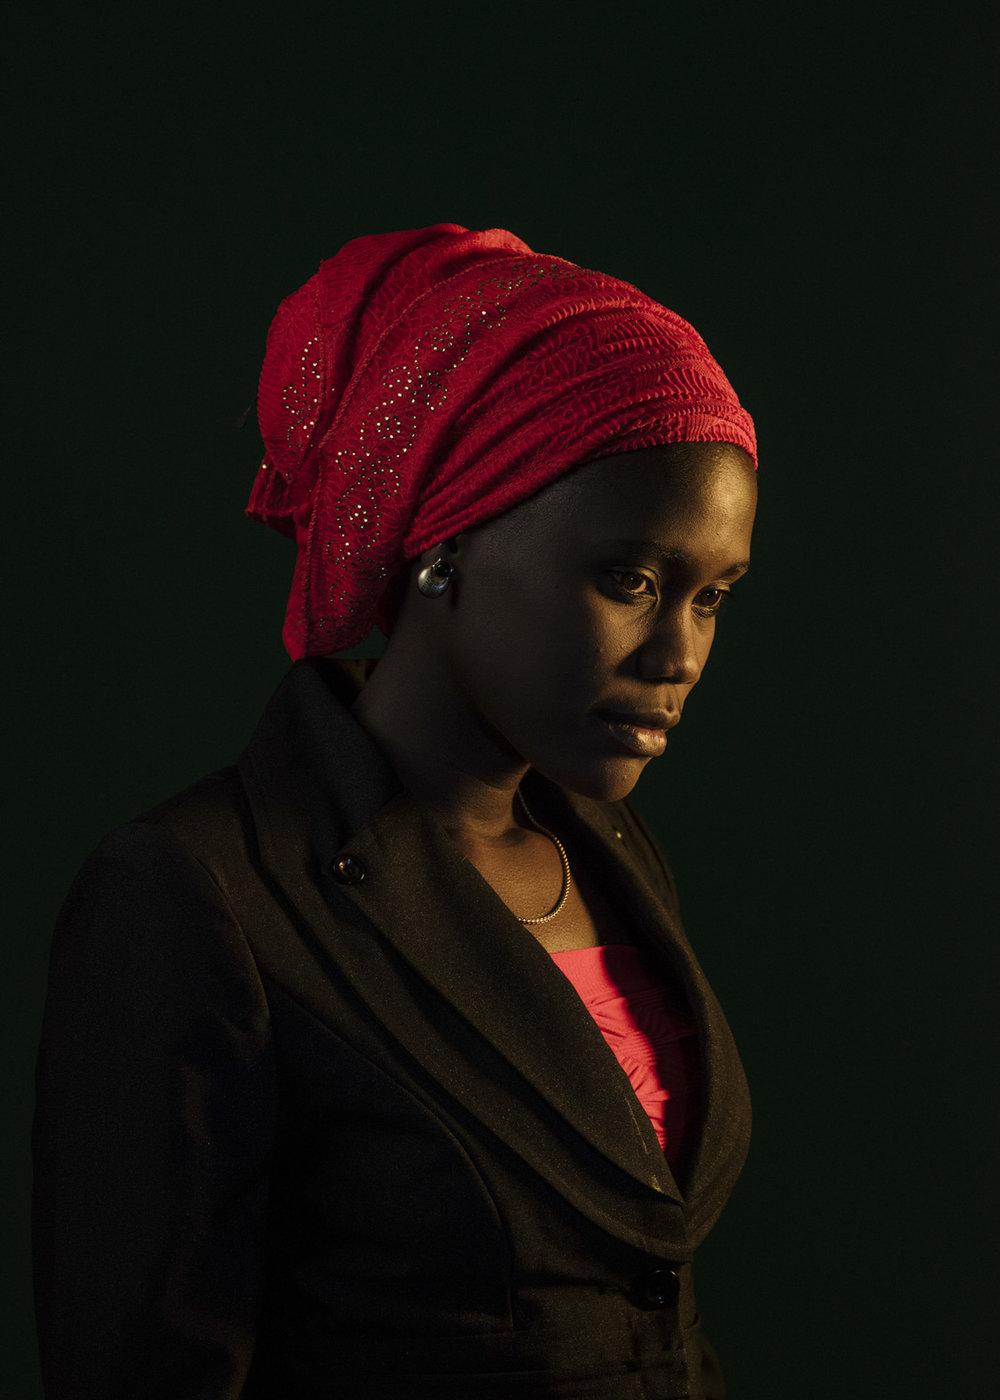 Deborah Andrawus, 'Chibok Girl' for  The New York Times